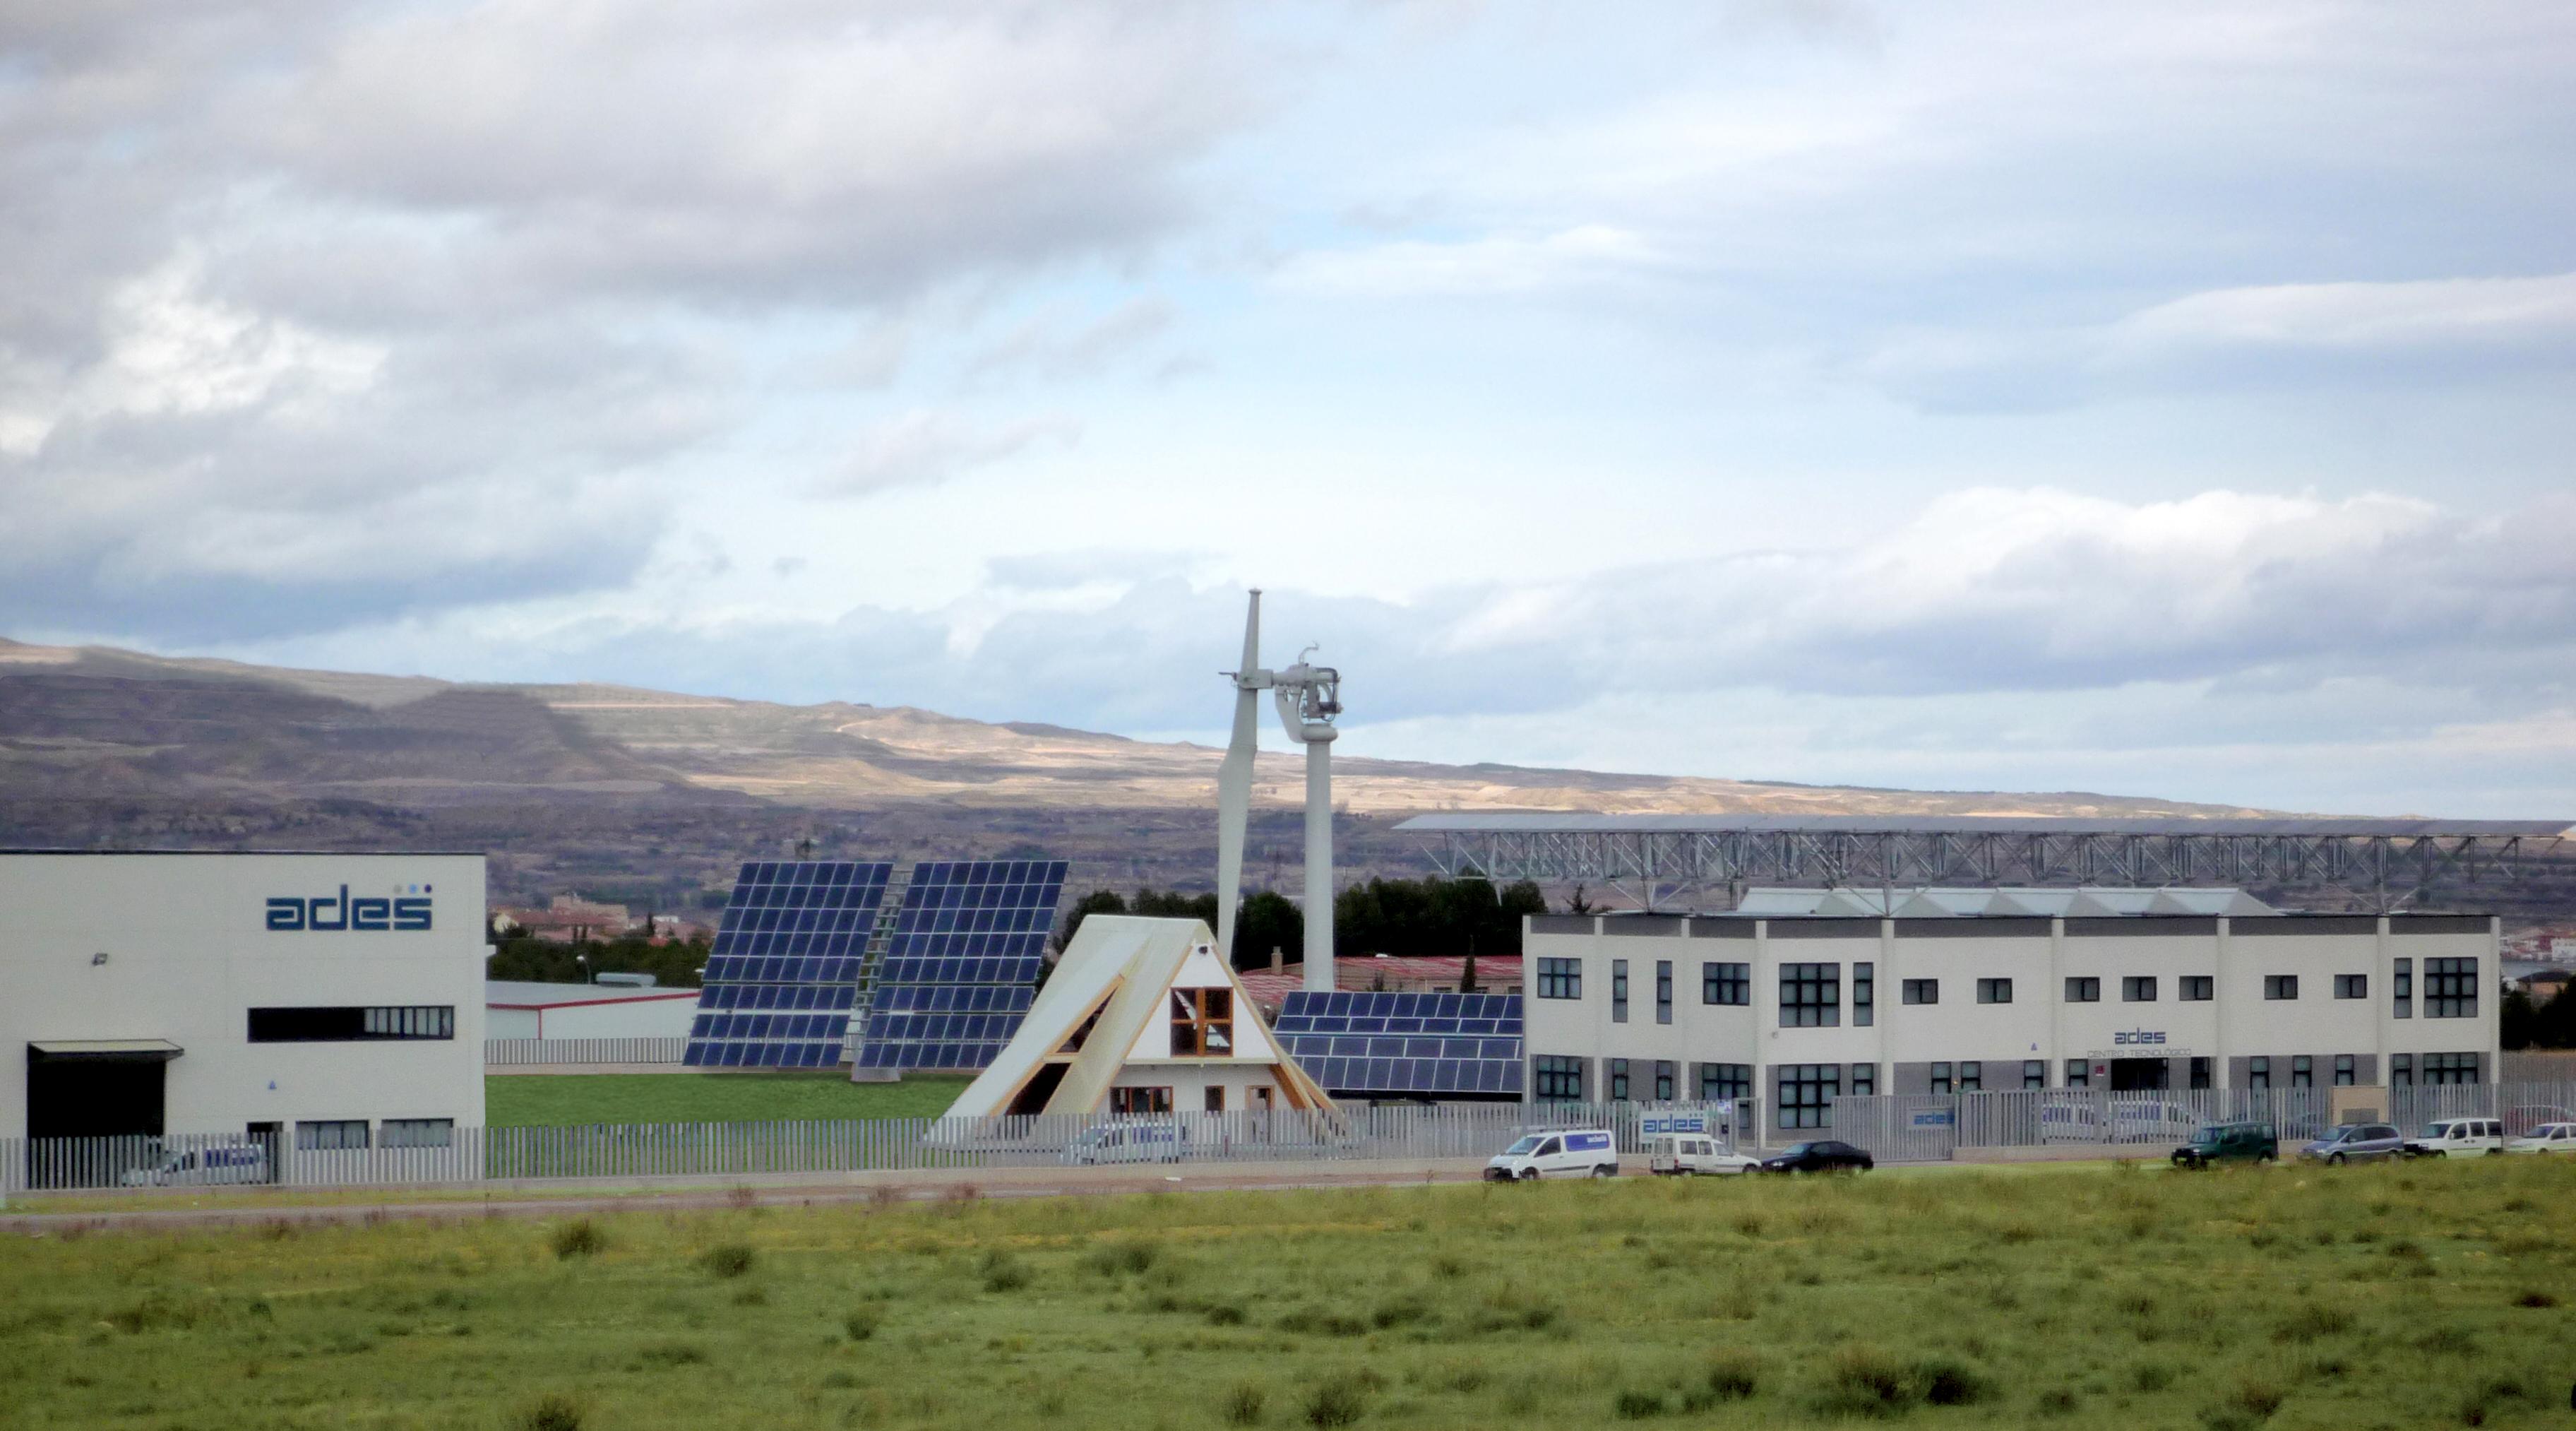 Ades. Energías renovables